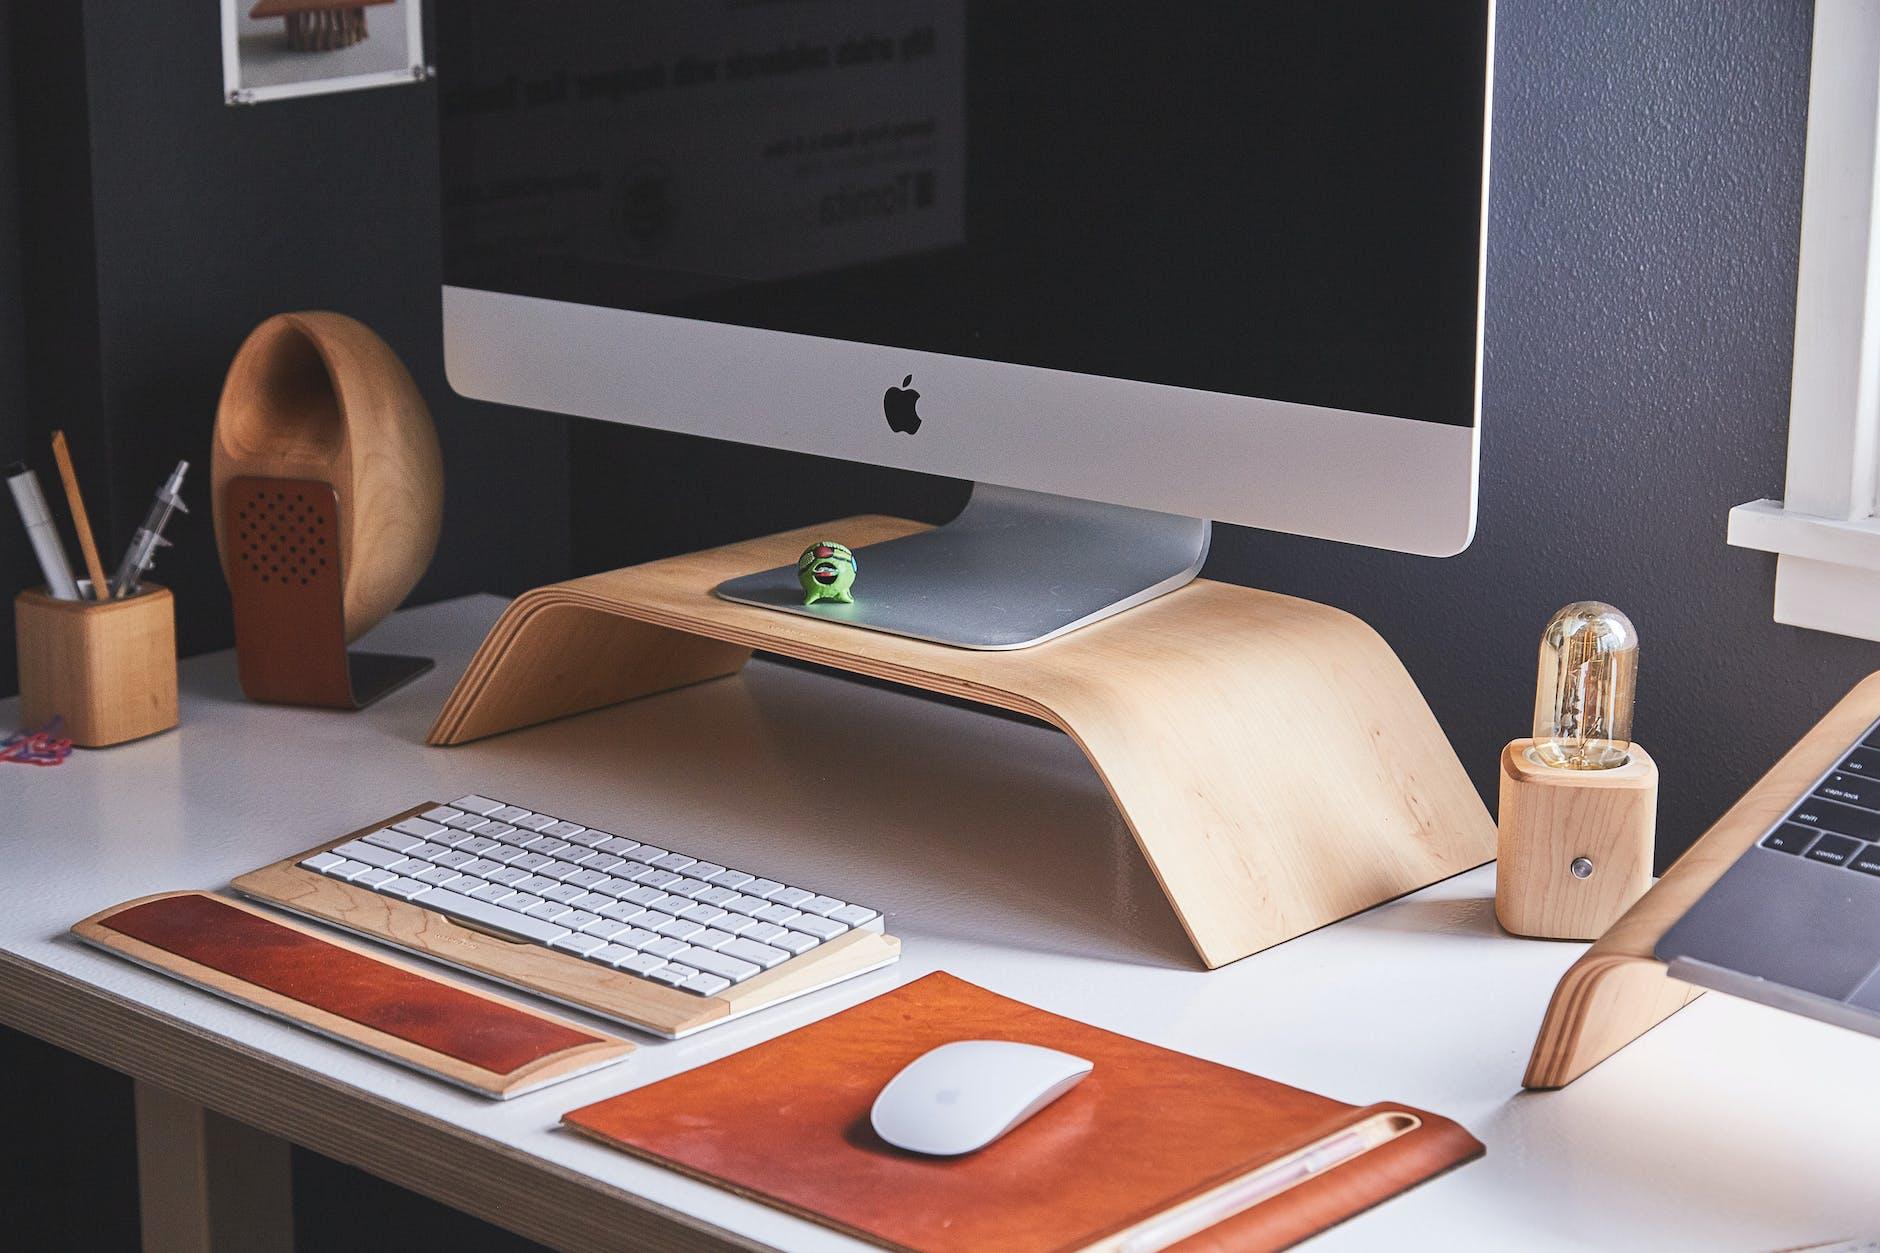 Mac Clean Software